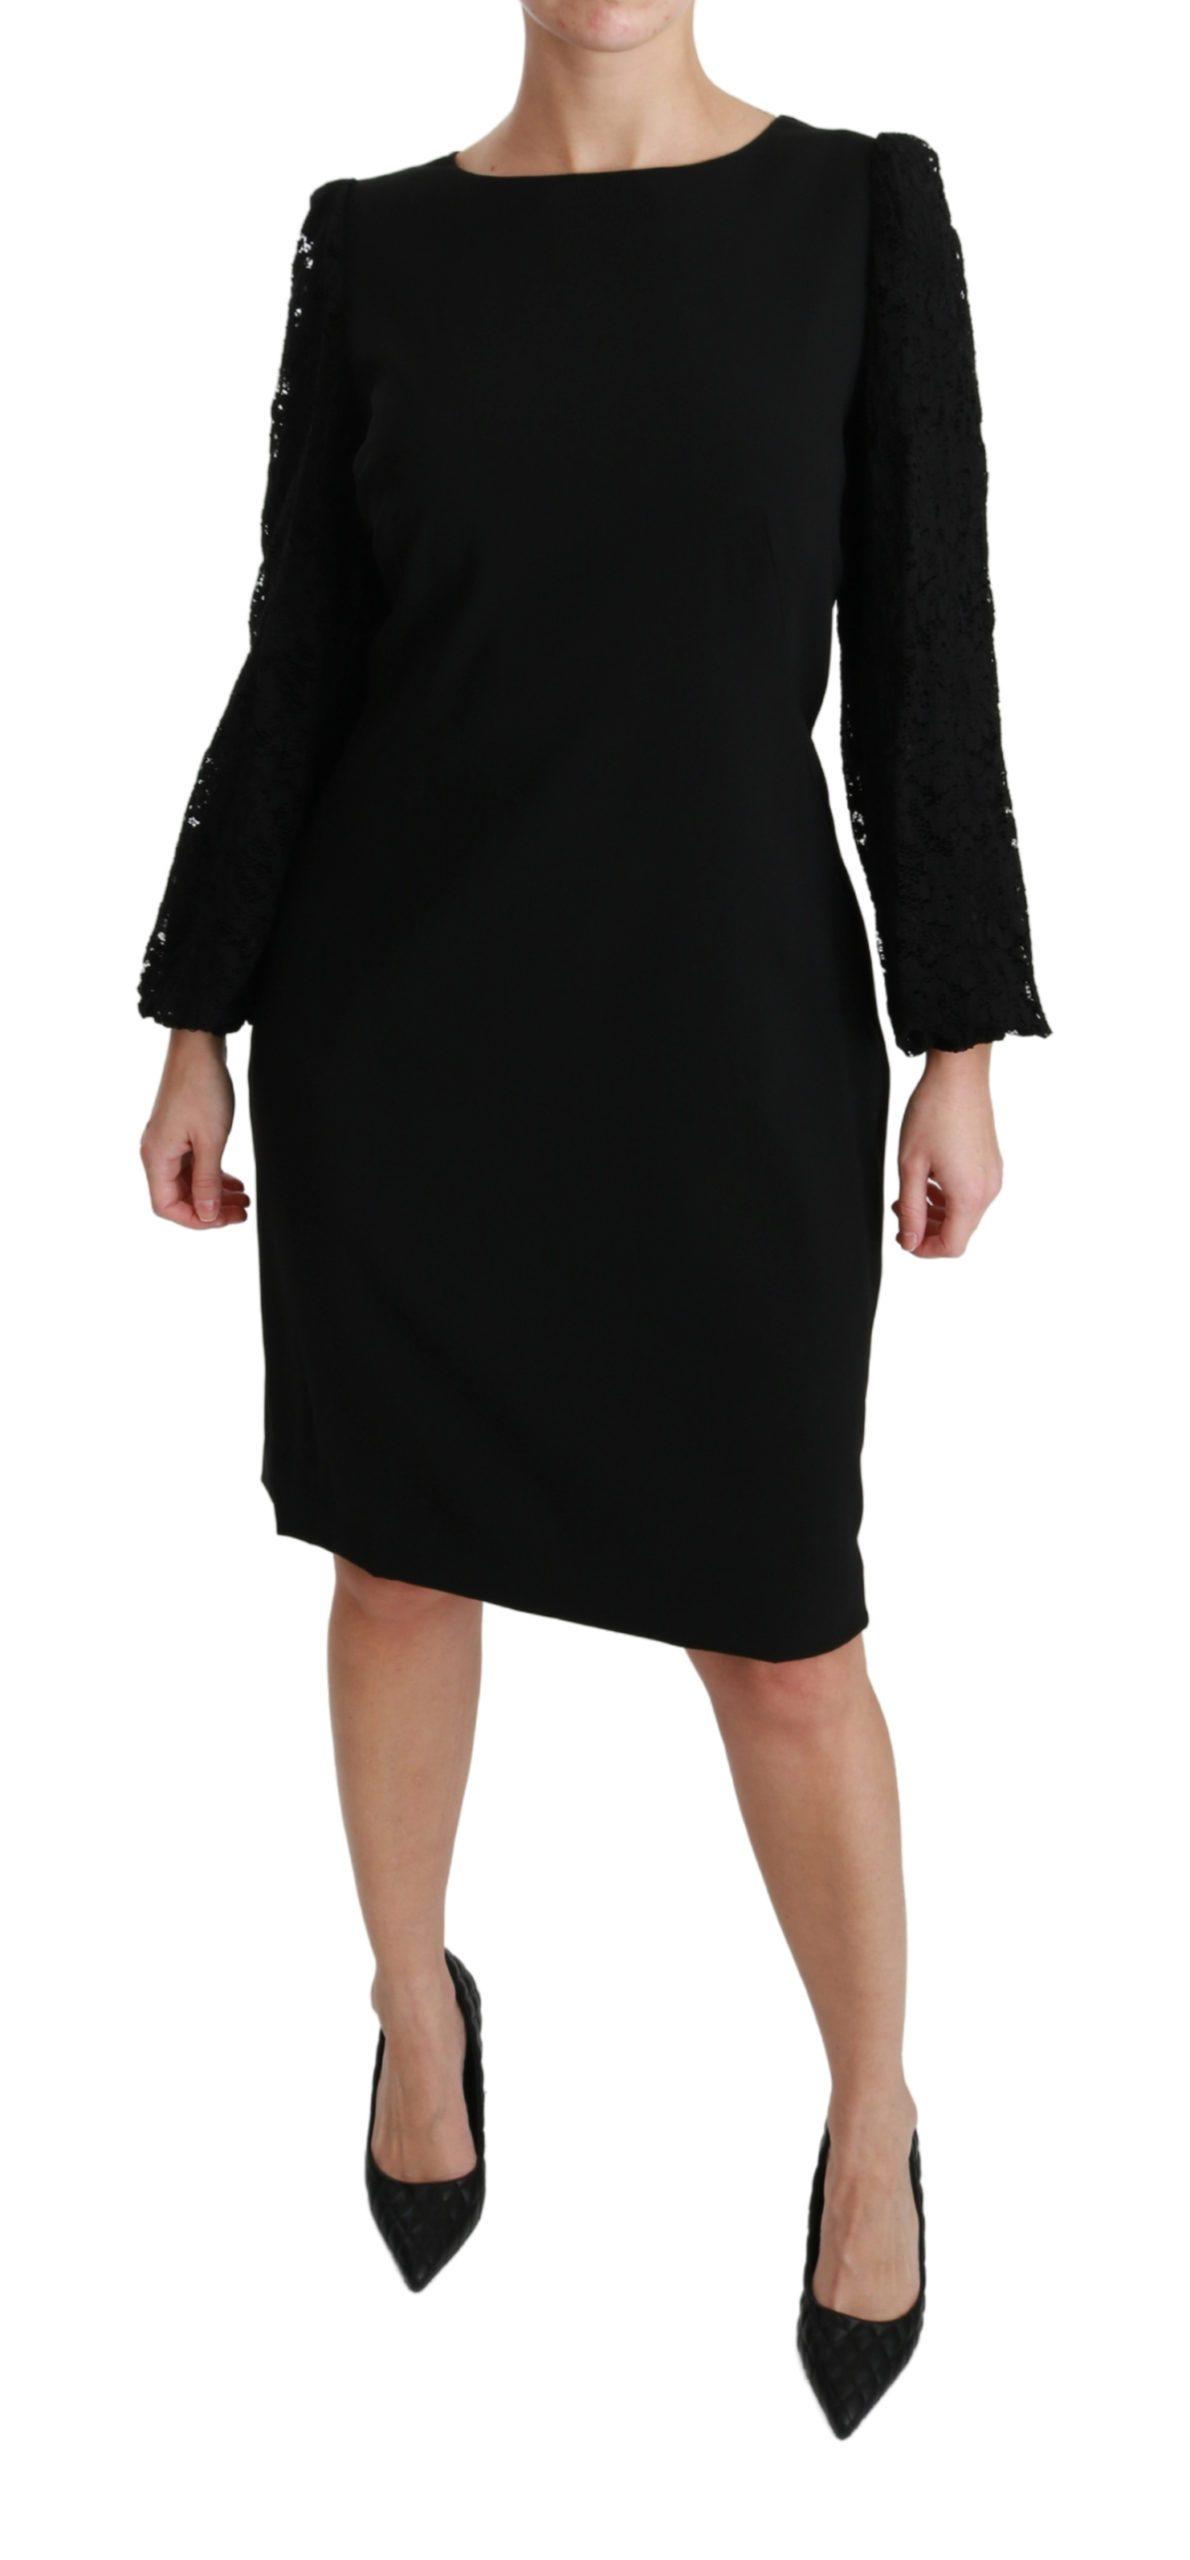 Dolce & Gabbana Women's Floral Lace Sheath Gown Dress Black DR2164 - IT36 XXS